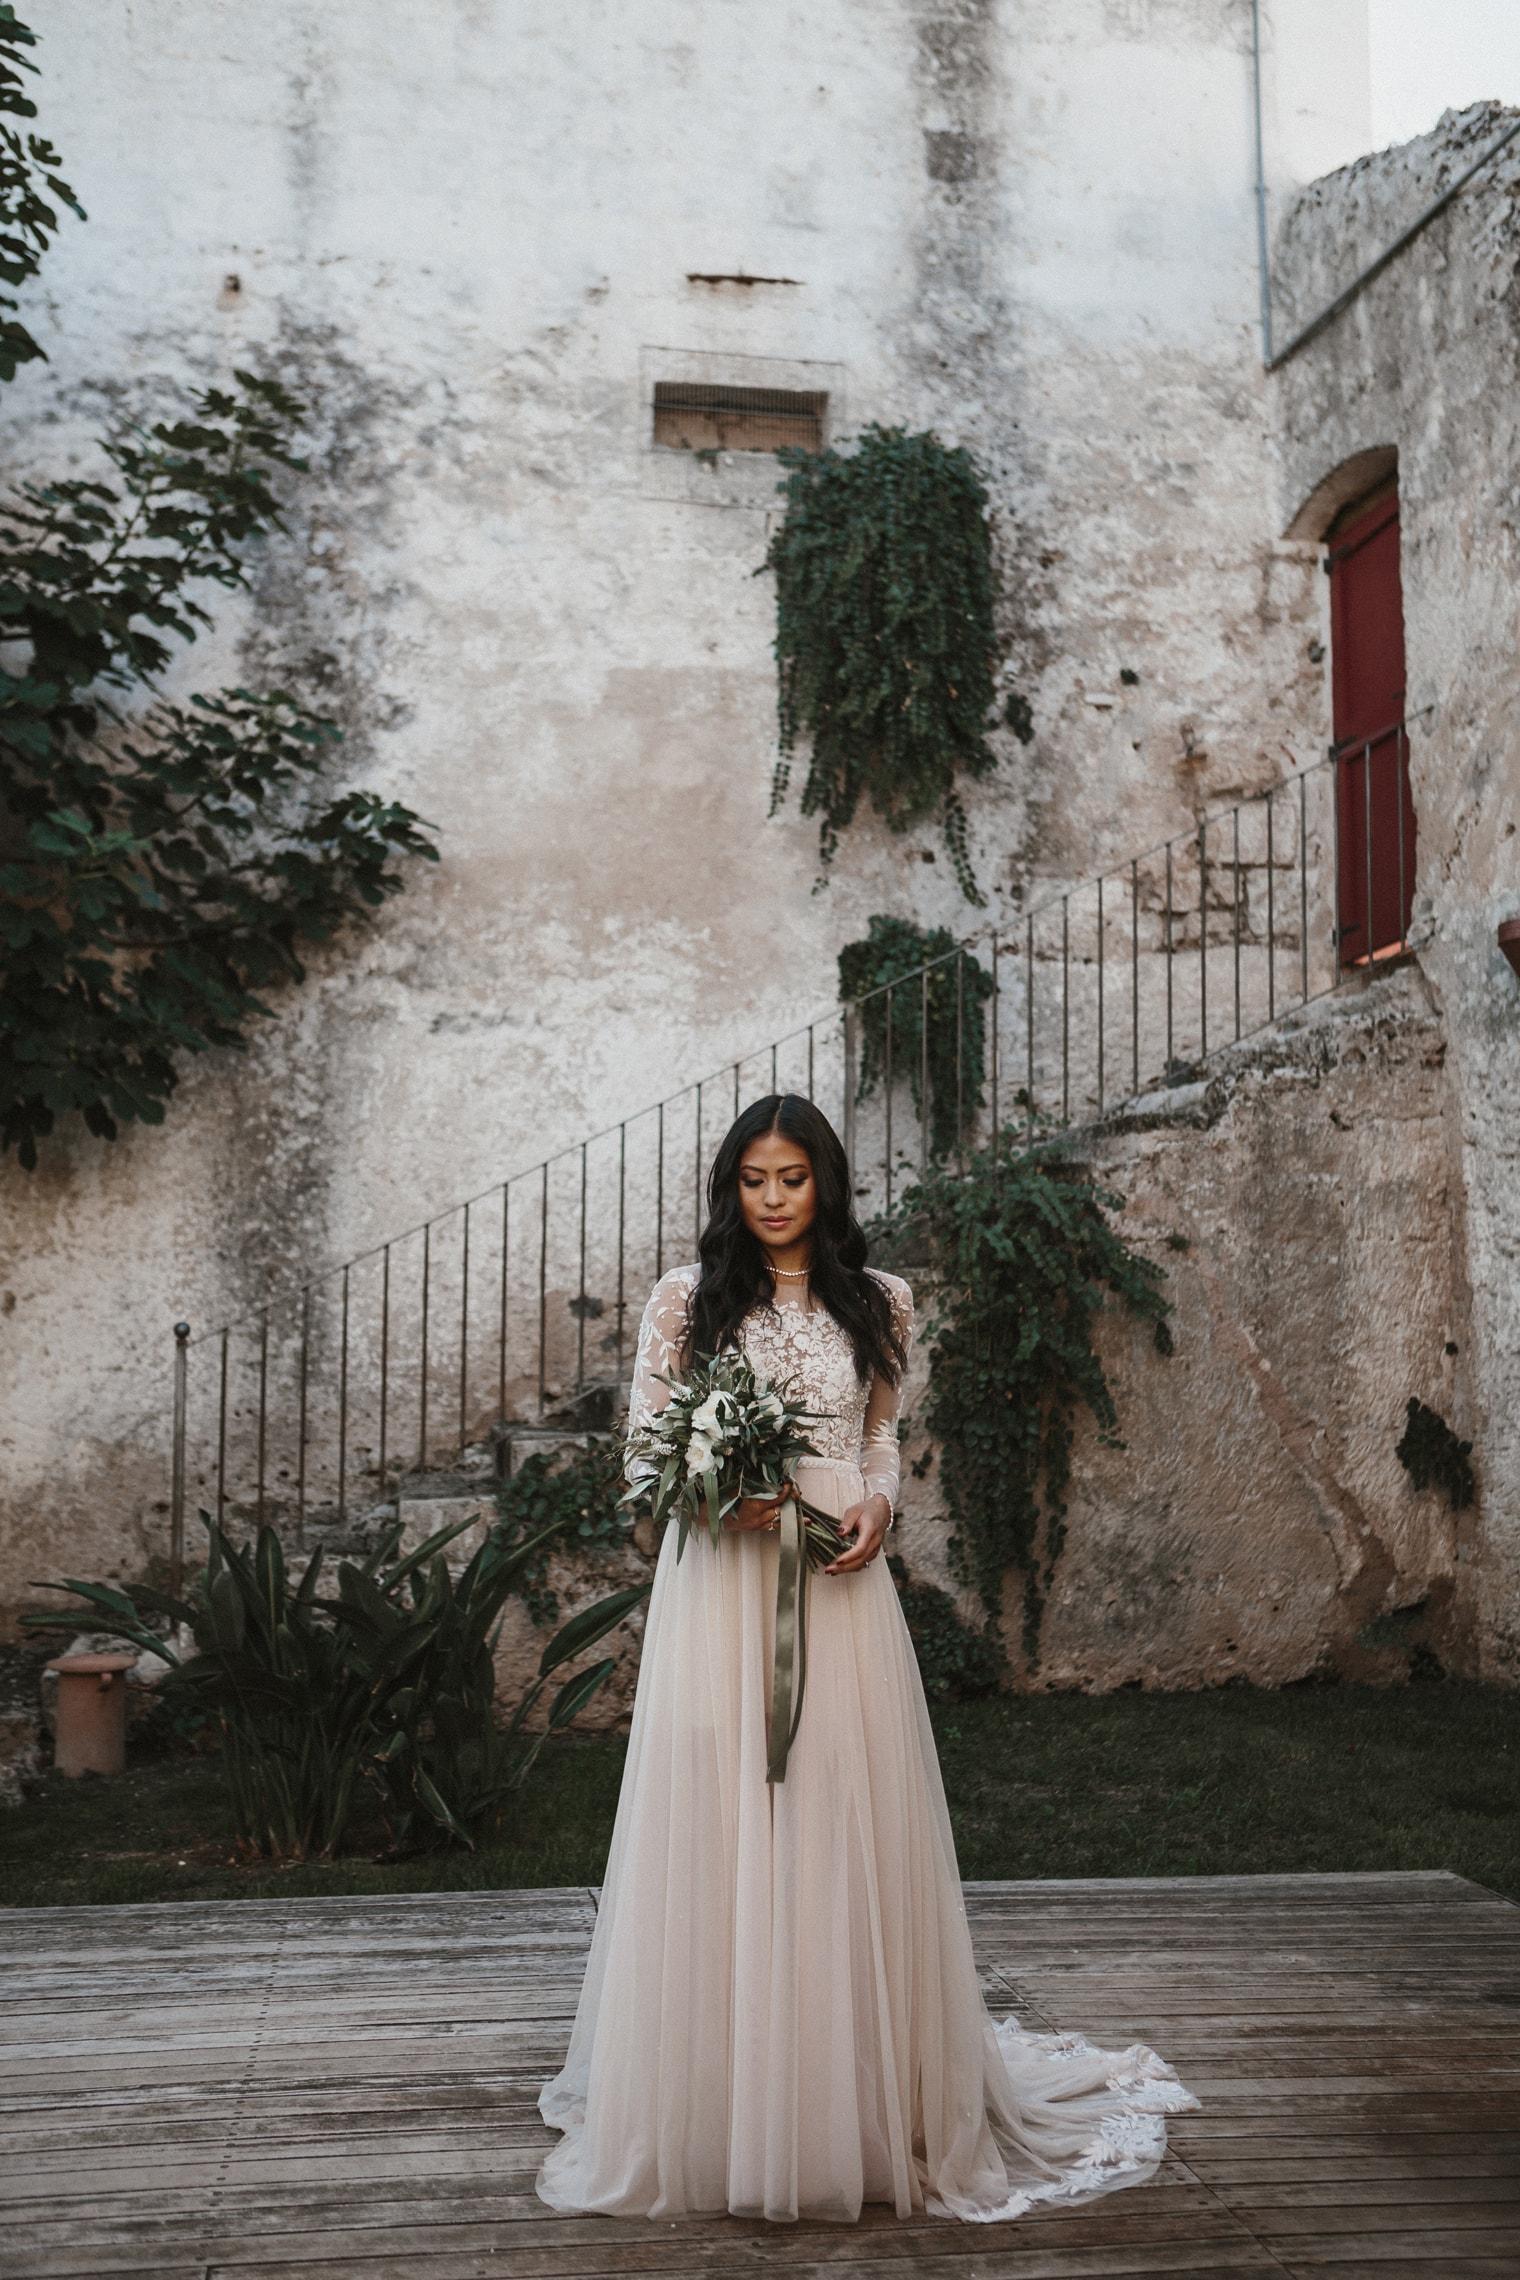 Apulian bride wearing beautiful Hermione de paula gown in italy for destination wedding